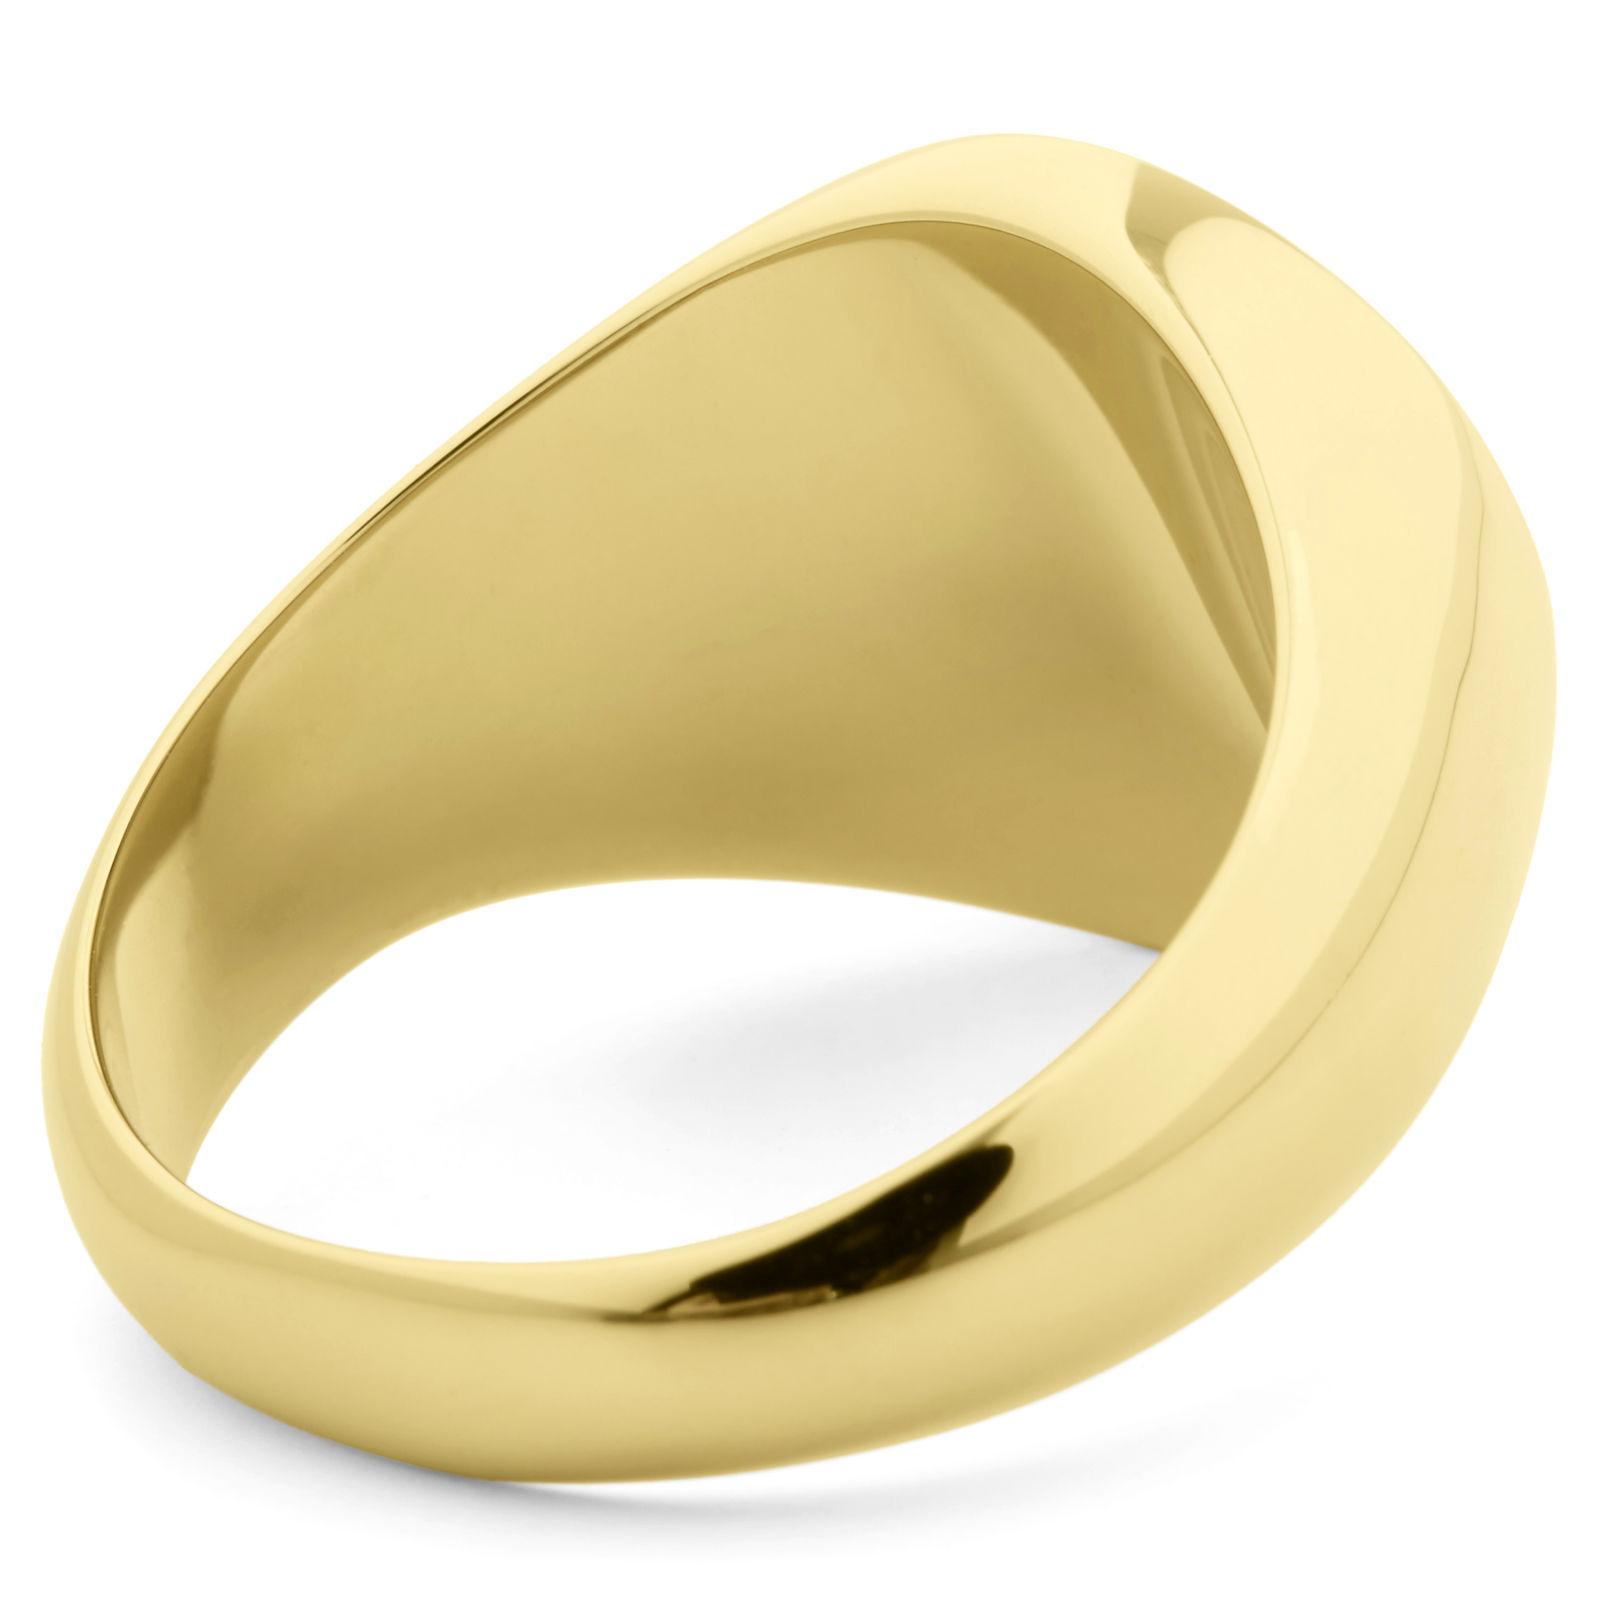 7f02701256 Χρυσό 925 Δαχτυλίδι Σφραγίδα Hunter s Offspring